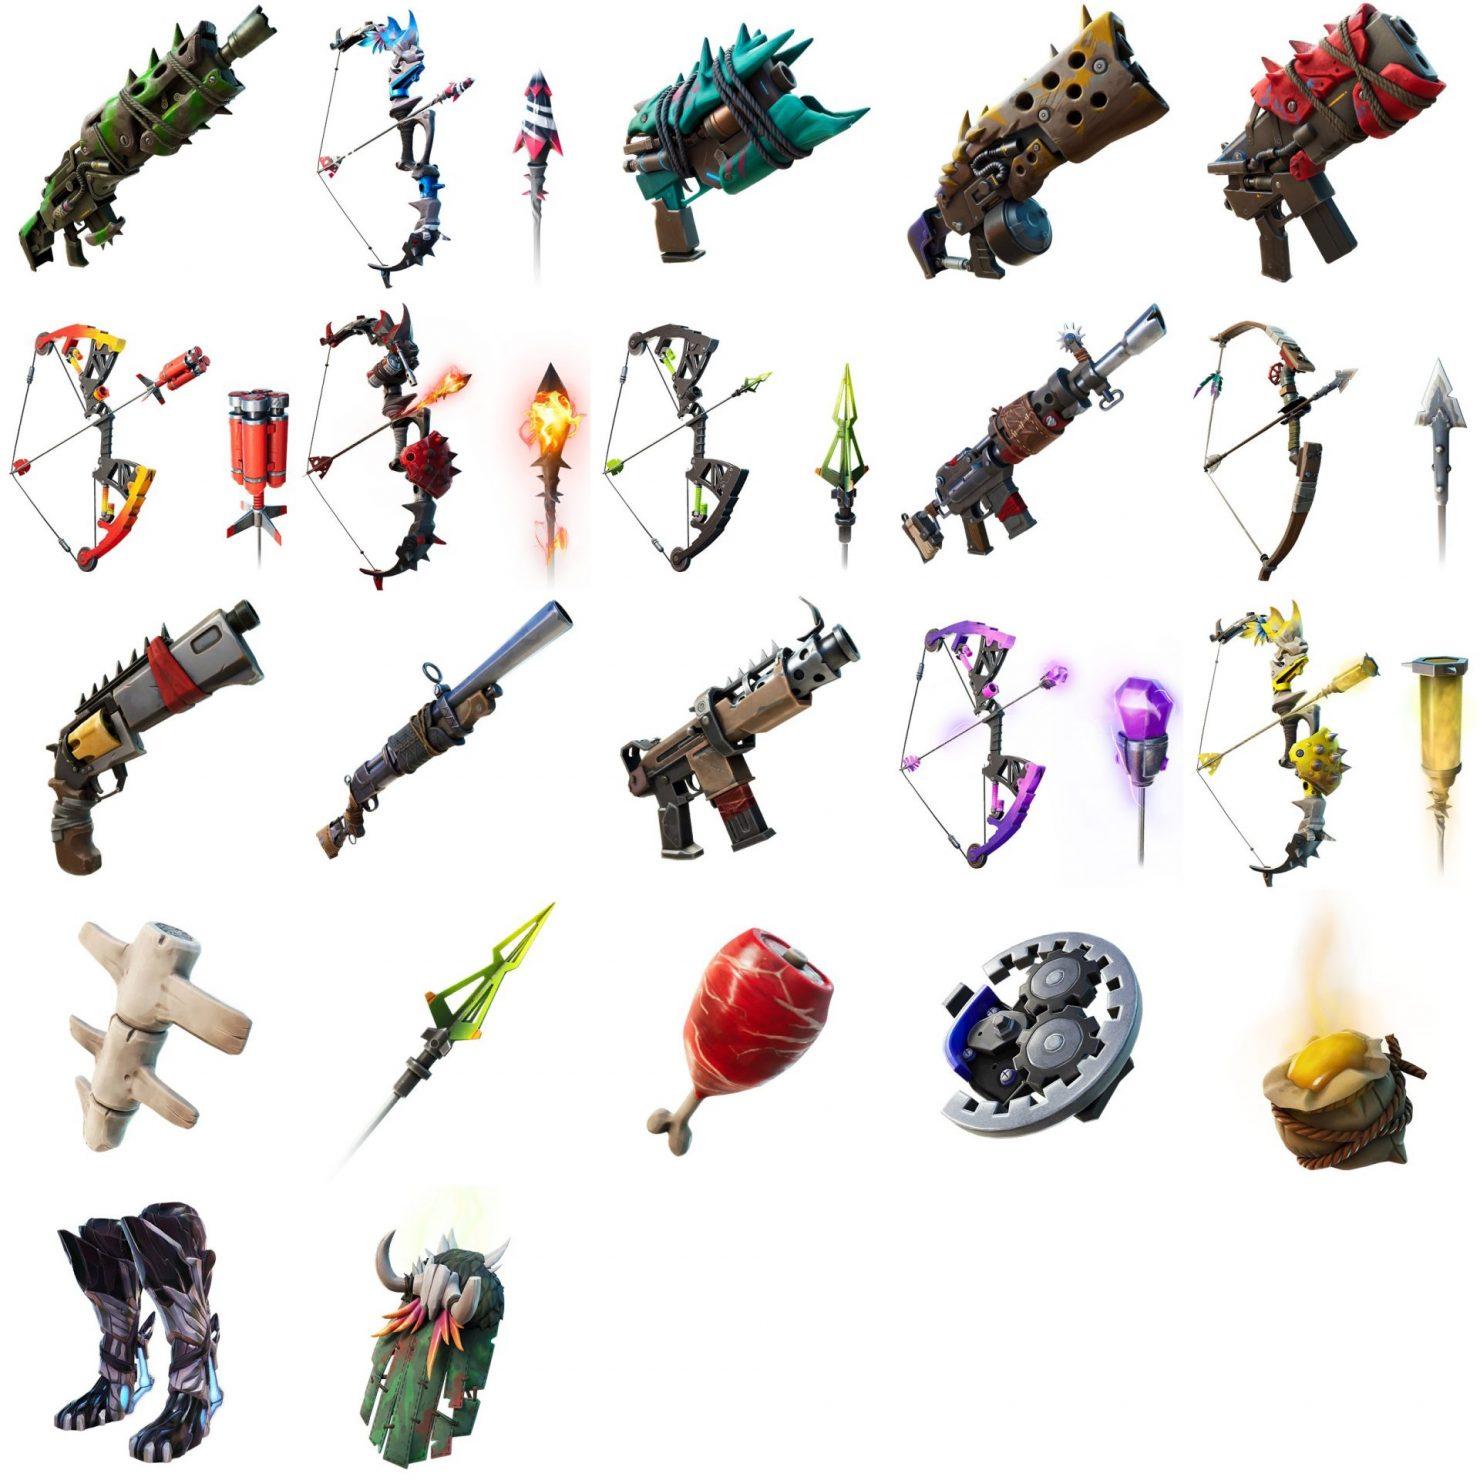 fortnite sezoni 6, fortnite exotic weapons